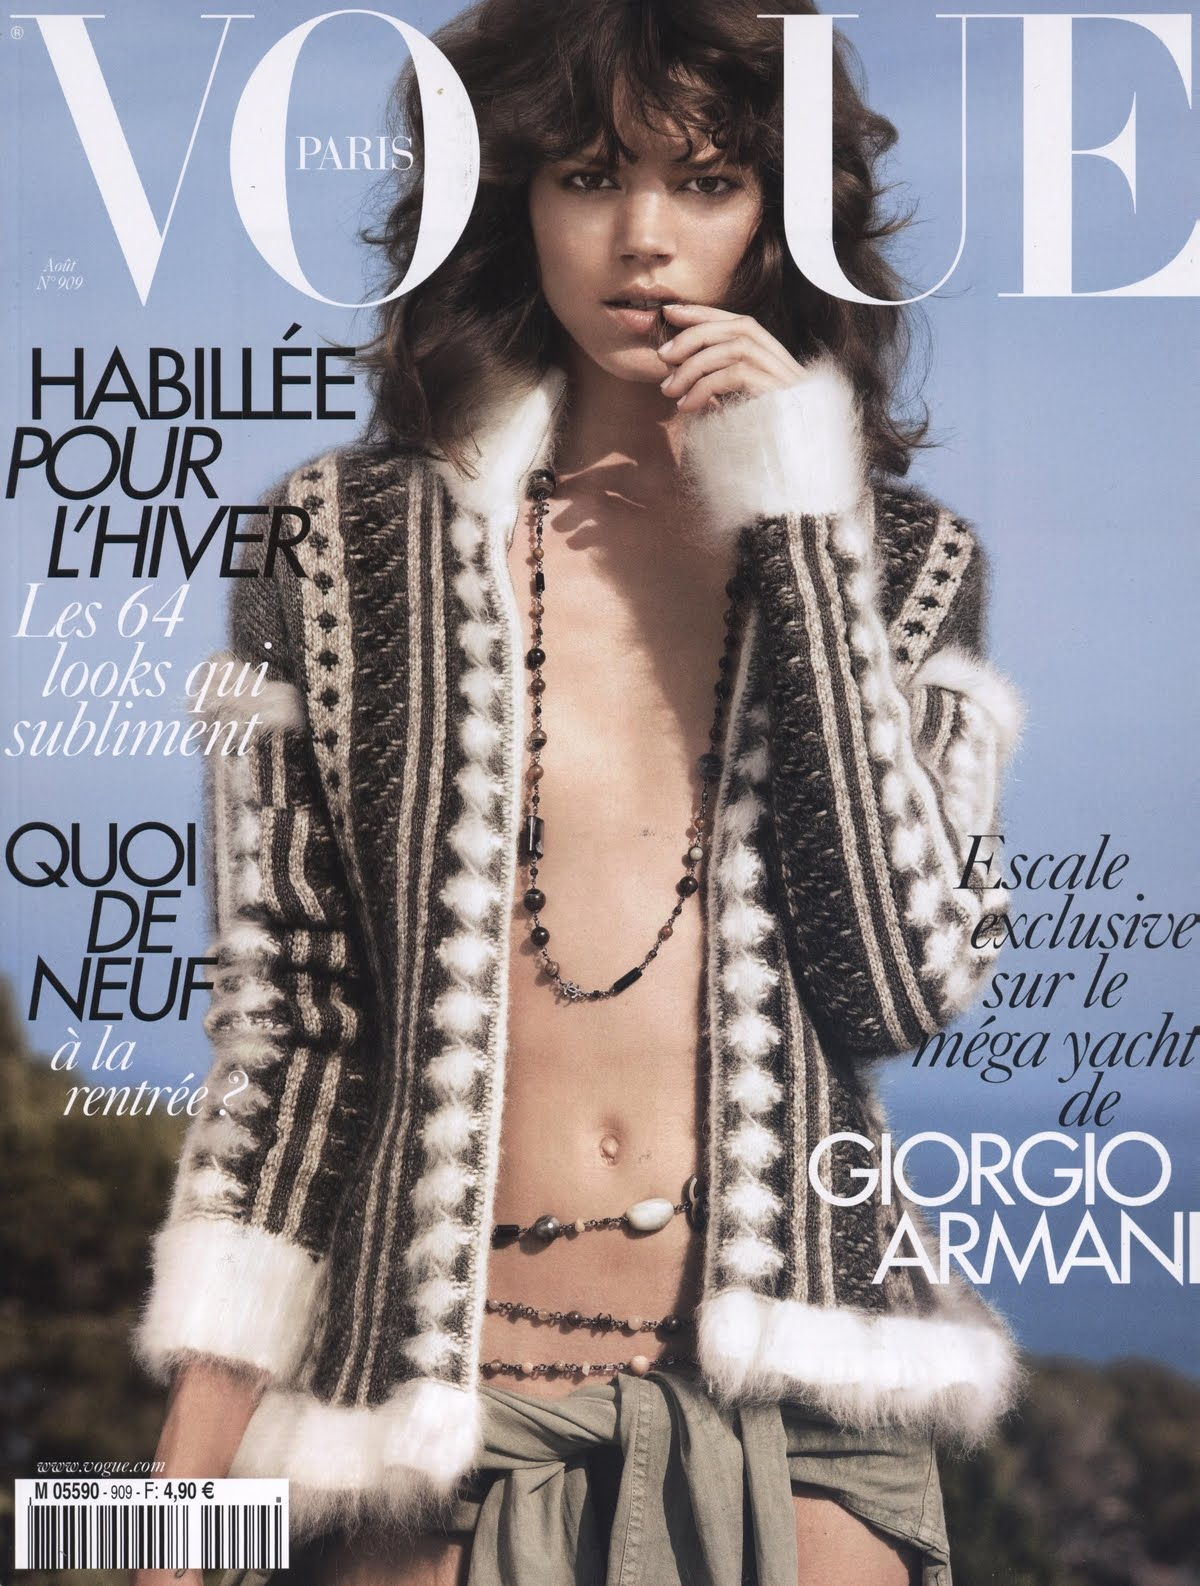 http://3.bp.blogspot.com/_FUYvMNTJrjU/TGXR2nwV7AI/AAAAAAAAItg/iTSCnStu_iI/s1600/Freja+Beha+Vogue+Paris.jpg